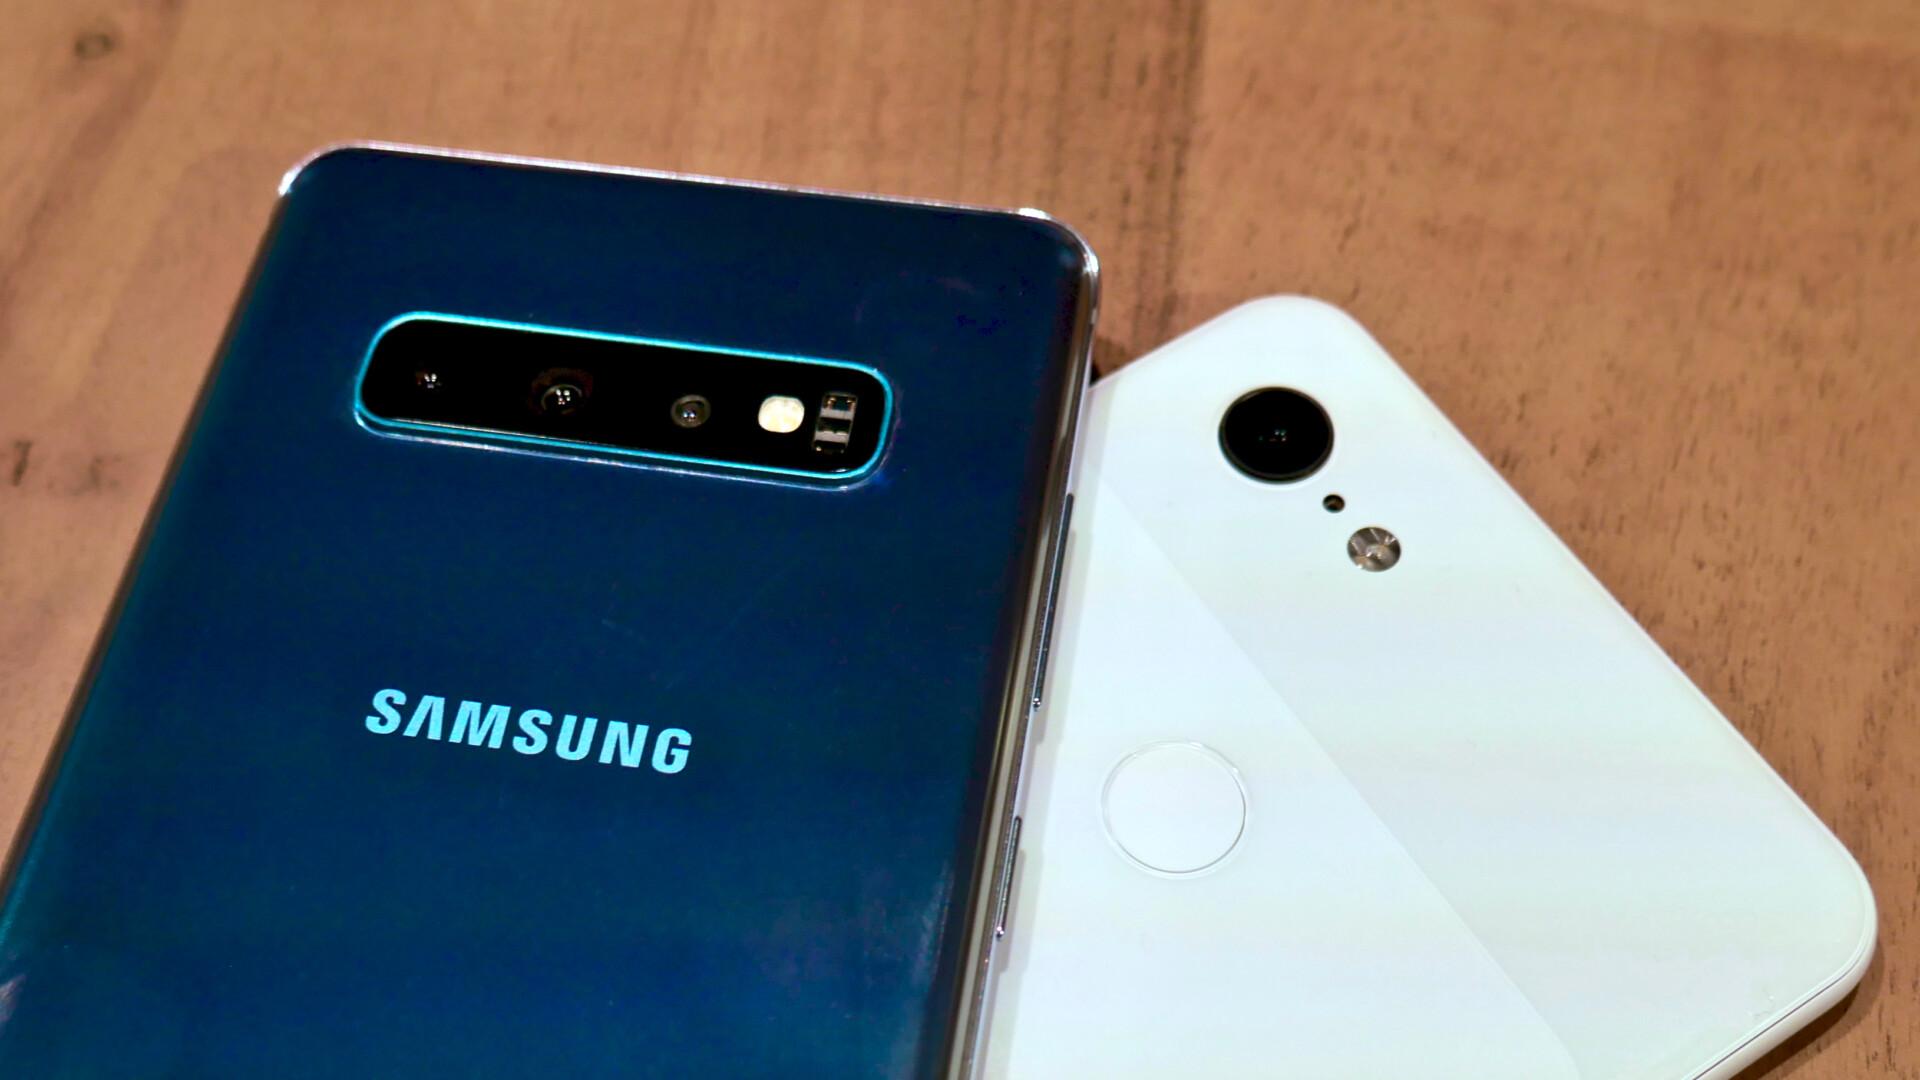 Galaxy S10 Plus vs Pixel 3 XL: Battle for Android's soul